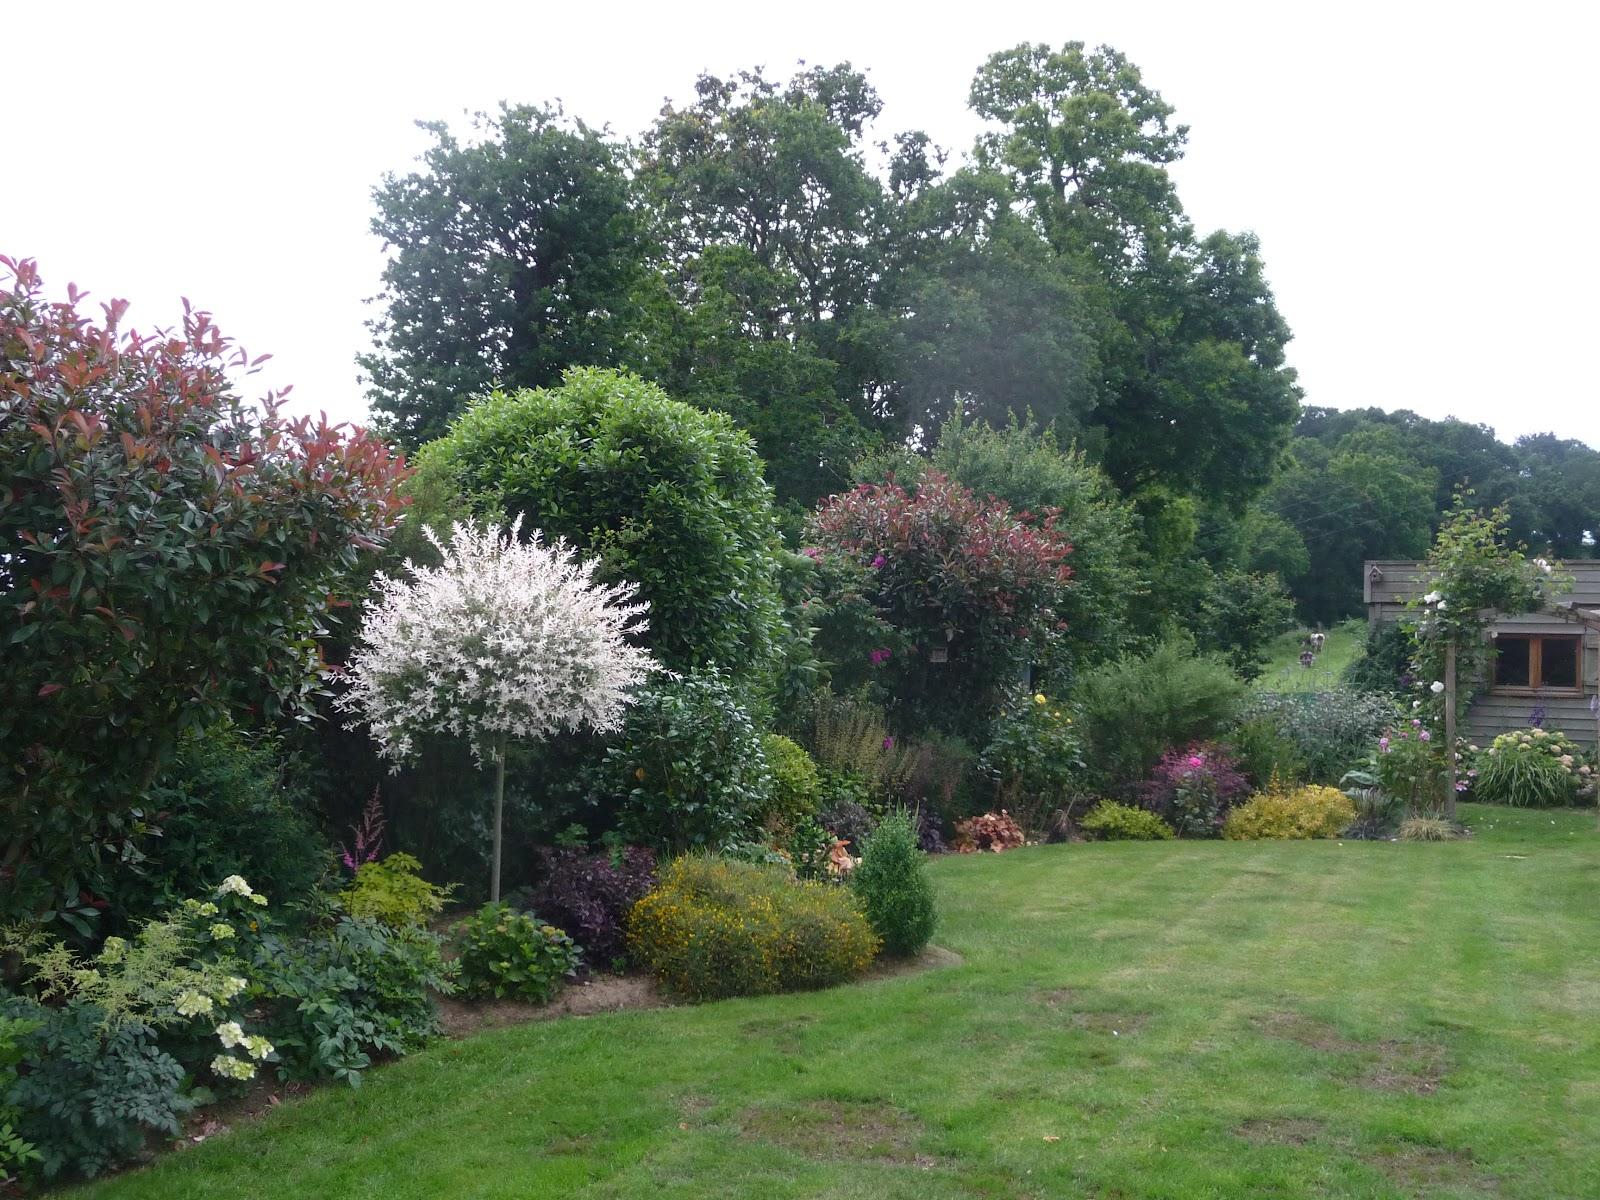 Ma terre de bruy re la vie de mon petit jardin - Quand tailler saule crevette ...